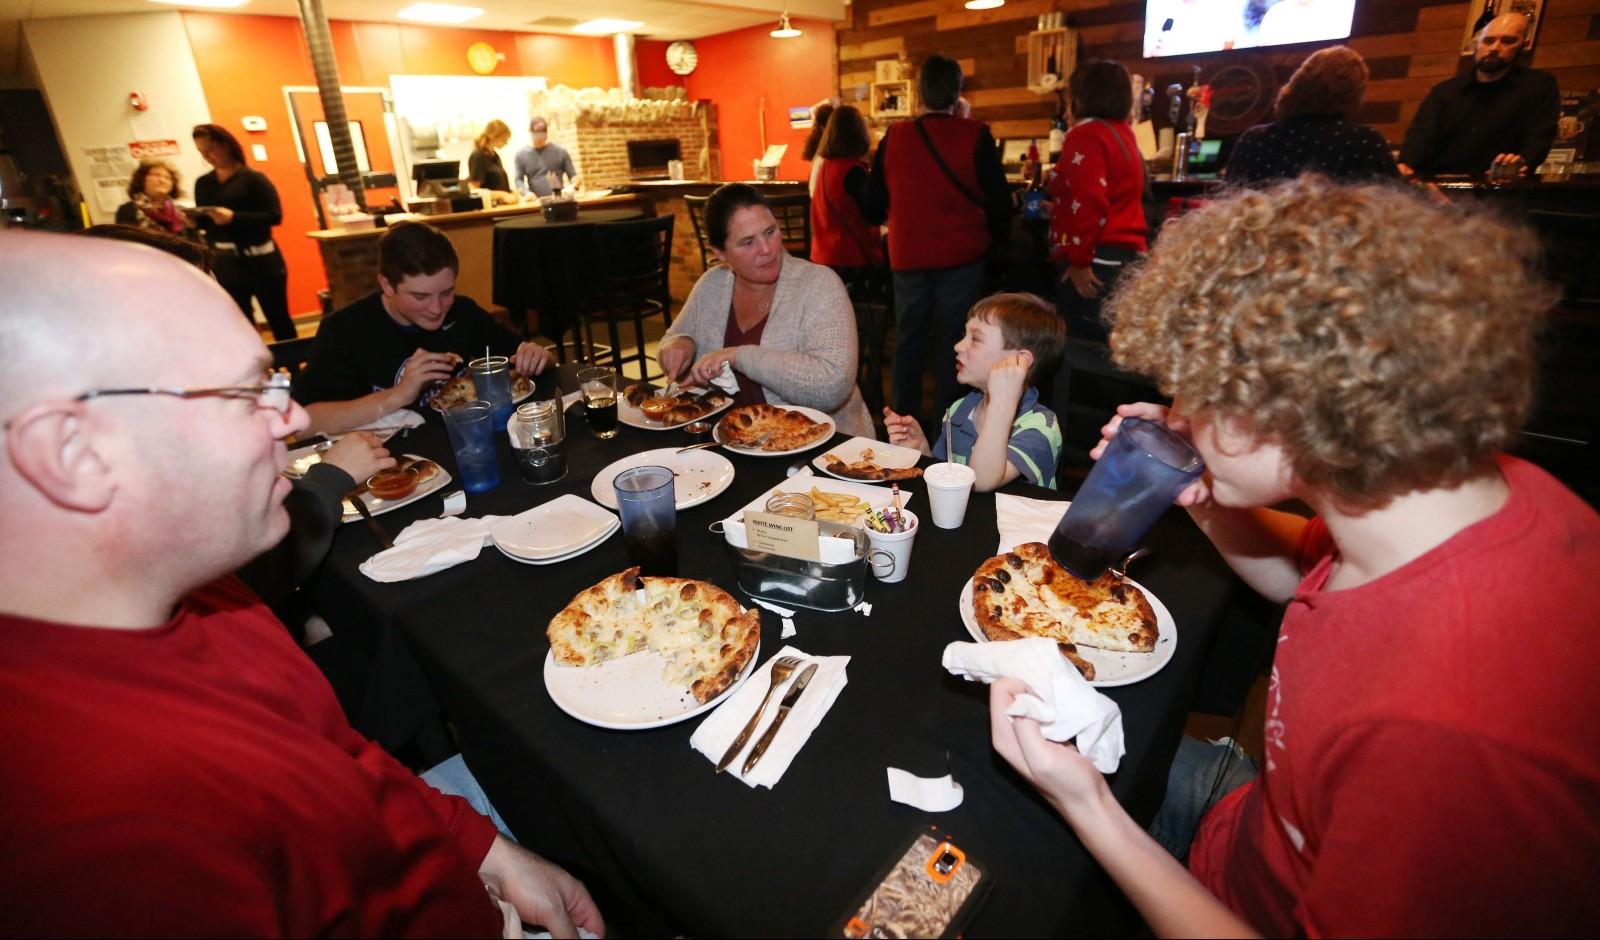 The Miller family of Hamburg has dinner at Butera's. See a photo gallery at buffalonews.com